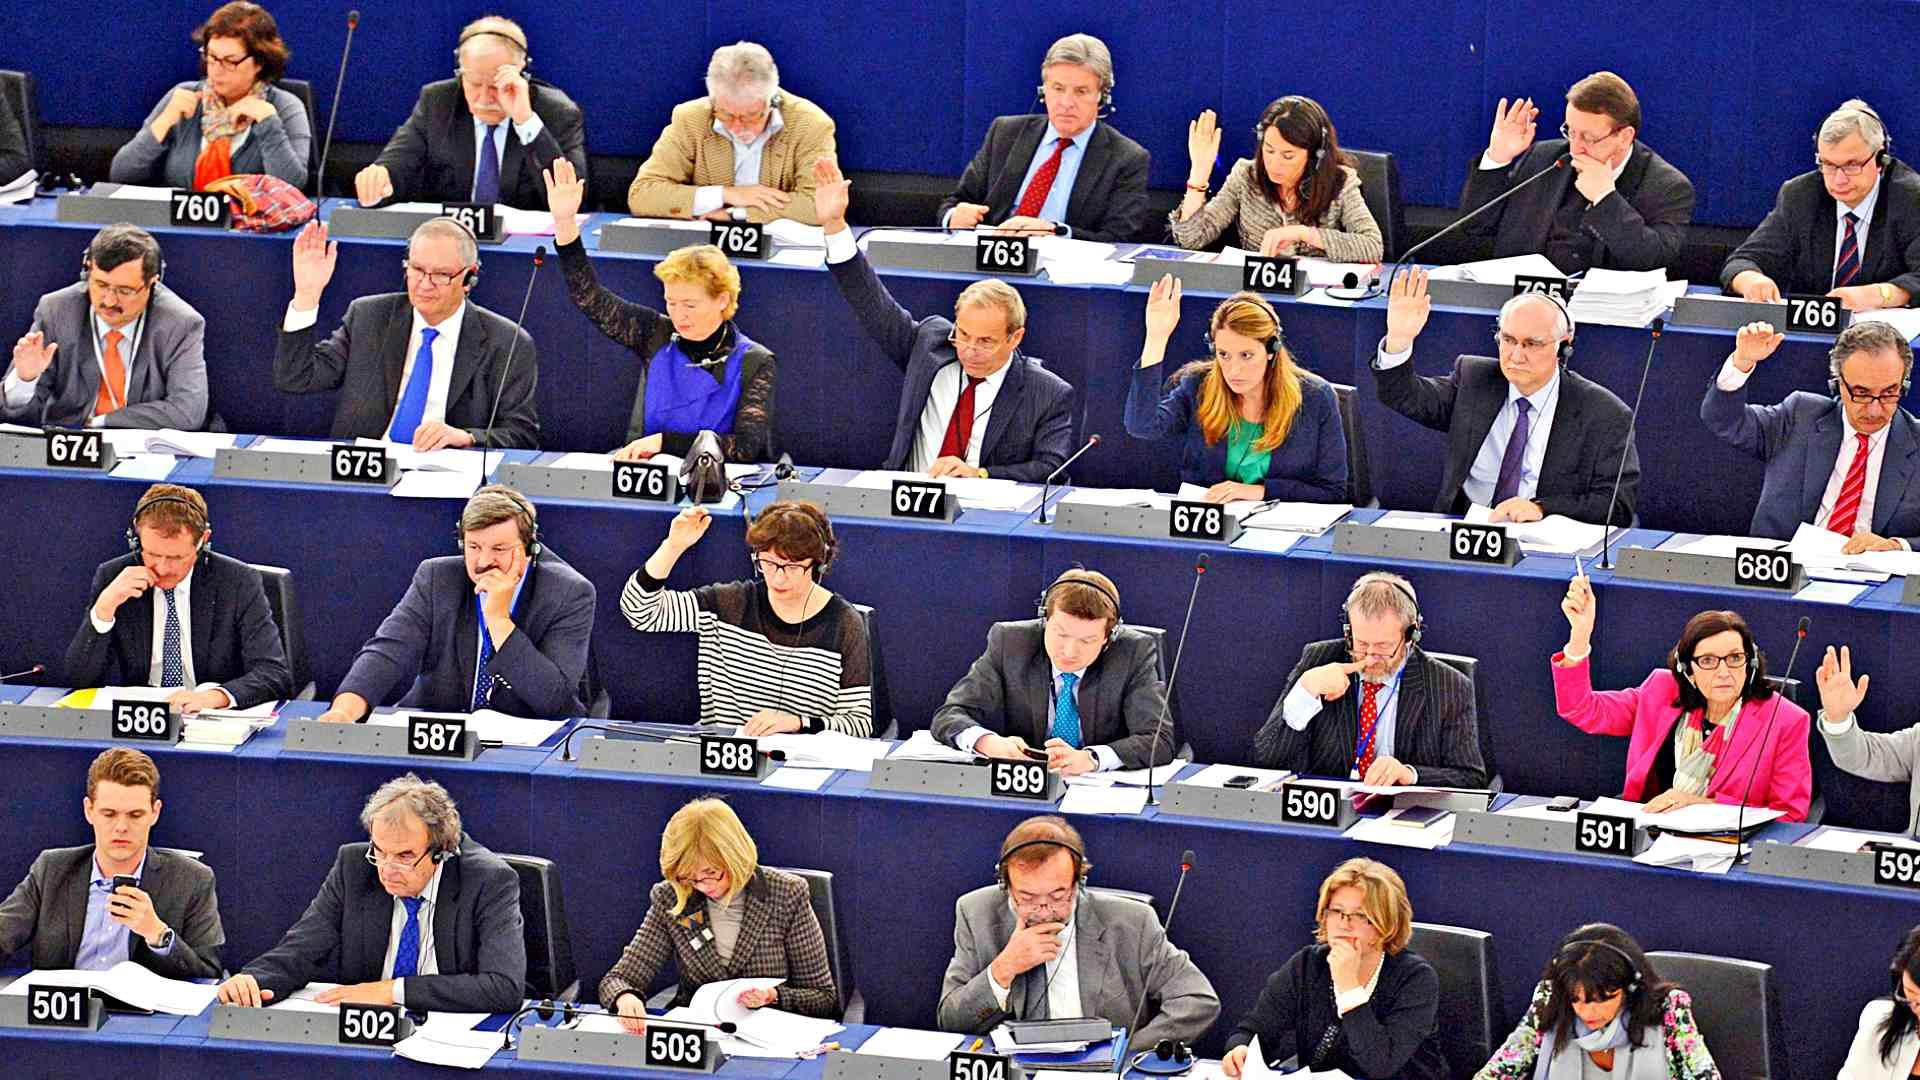 blockchain Europai Parlament blokklanc